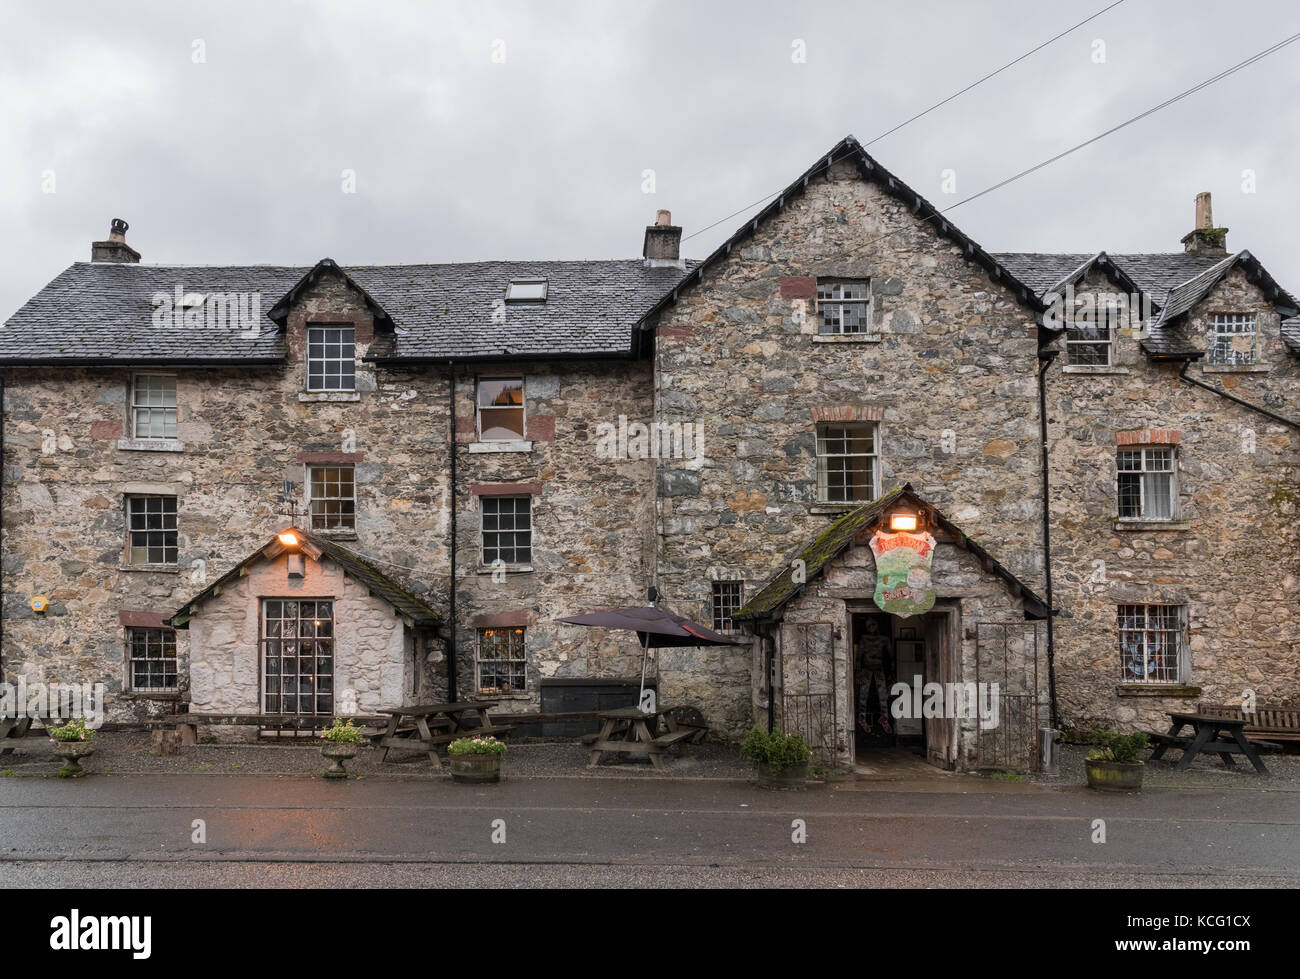 The Drovers Inn >> The Drovers Inn Hotel Restaurant Pub In Inverarnan North Loch